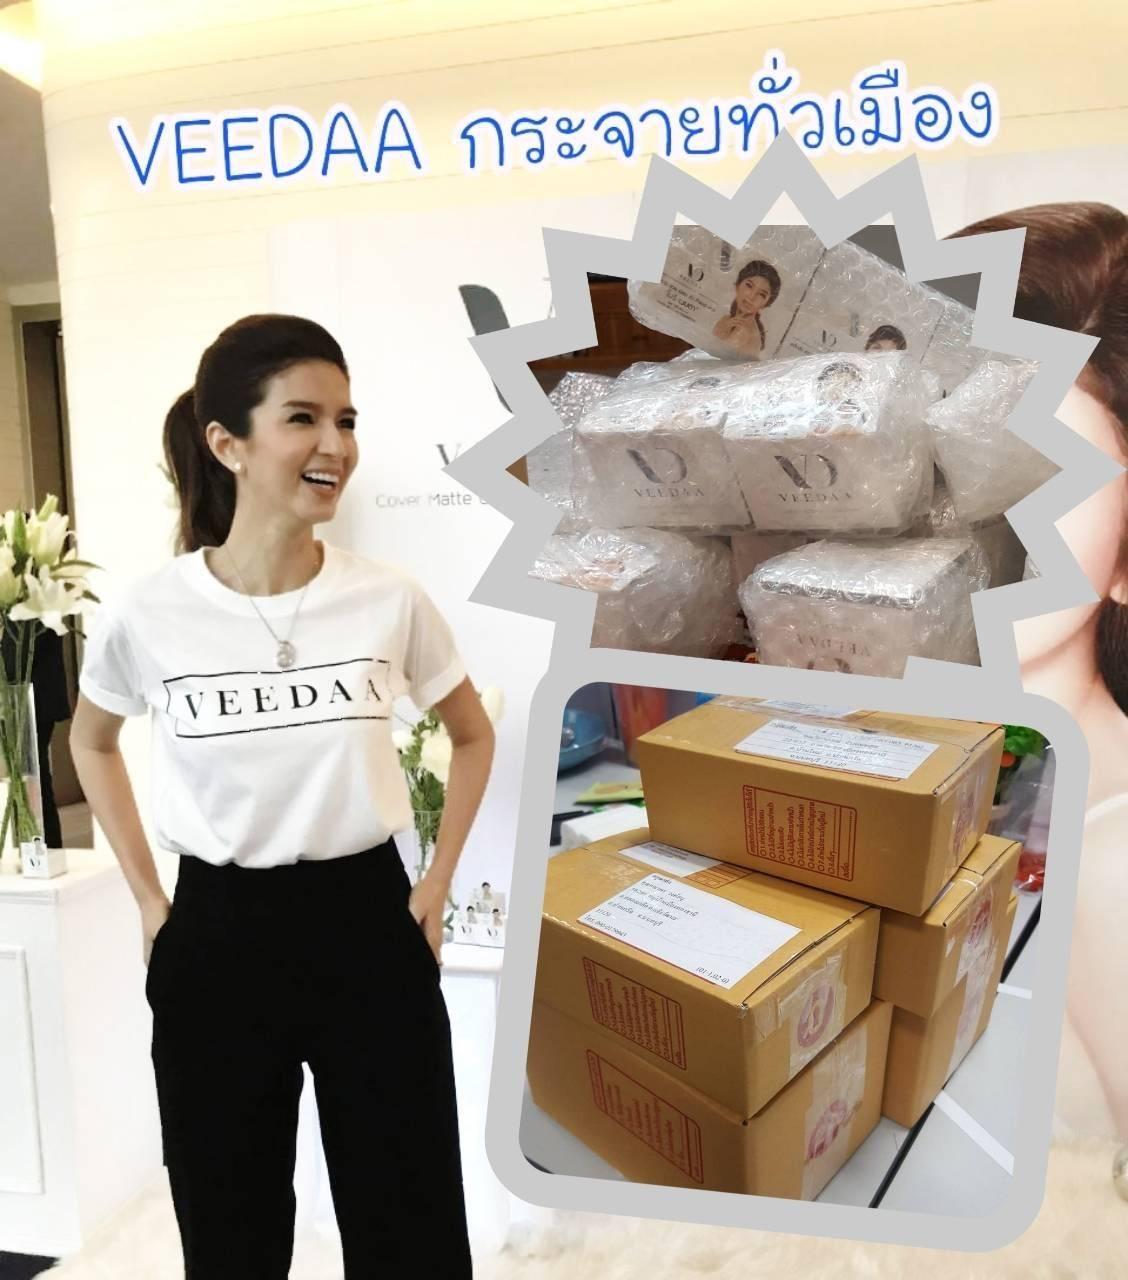 veedaa กระจายทั่วเมือง